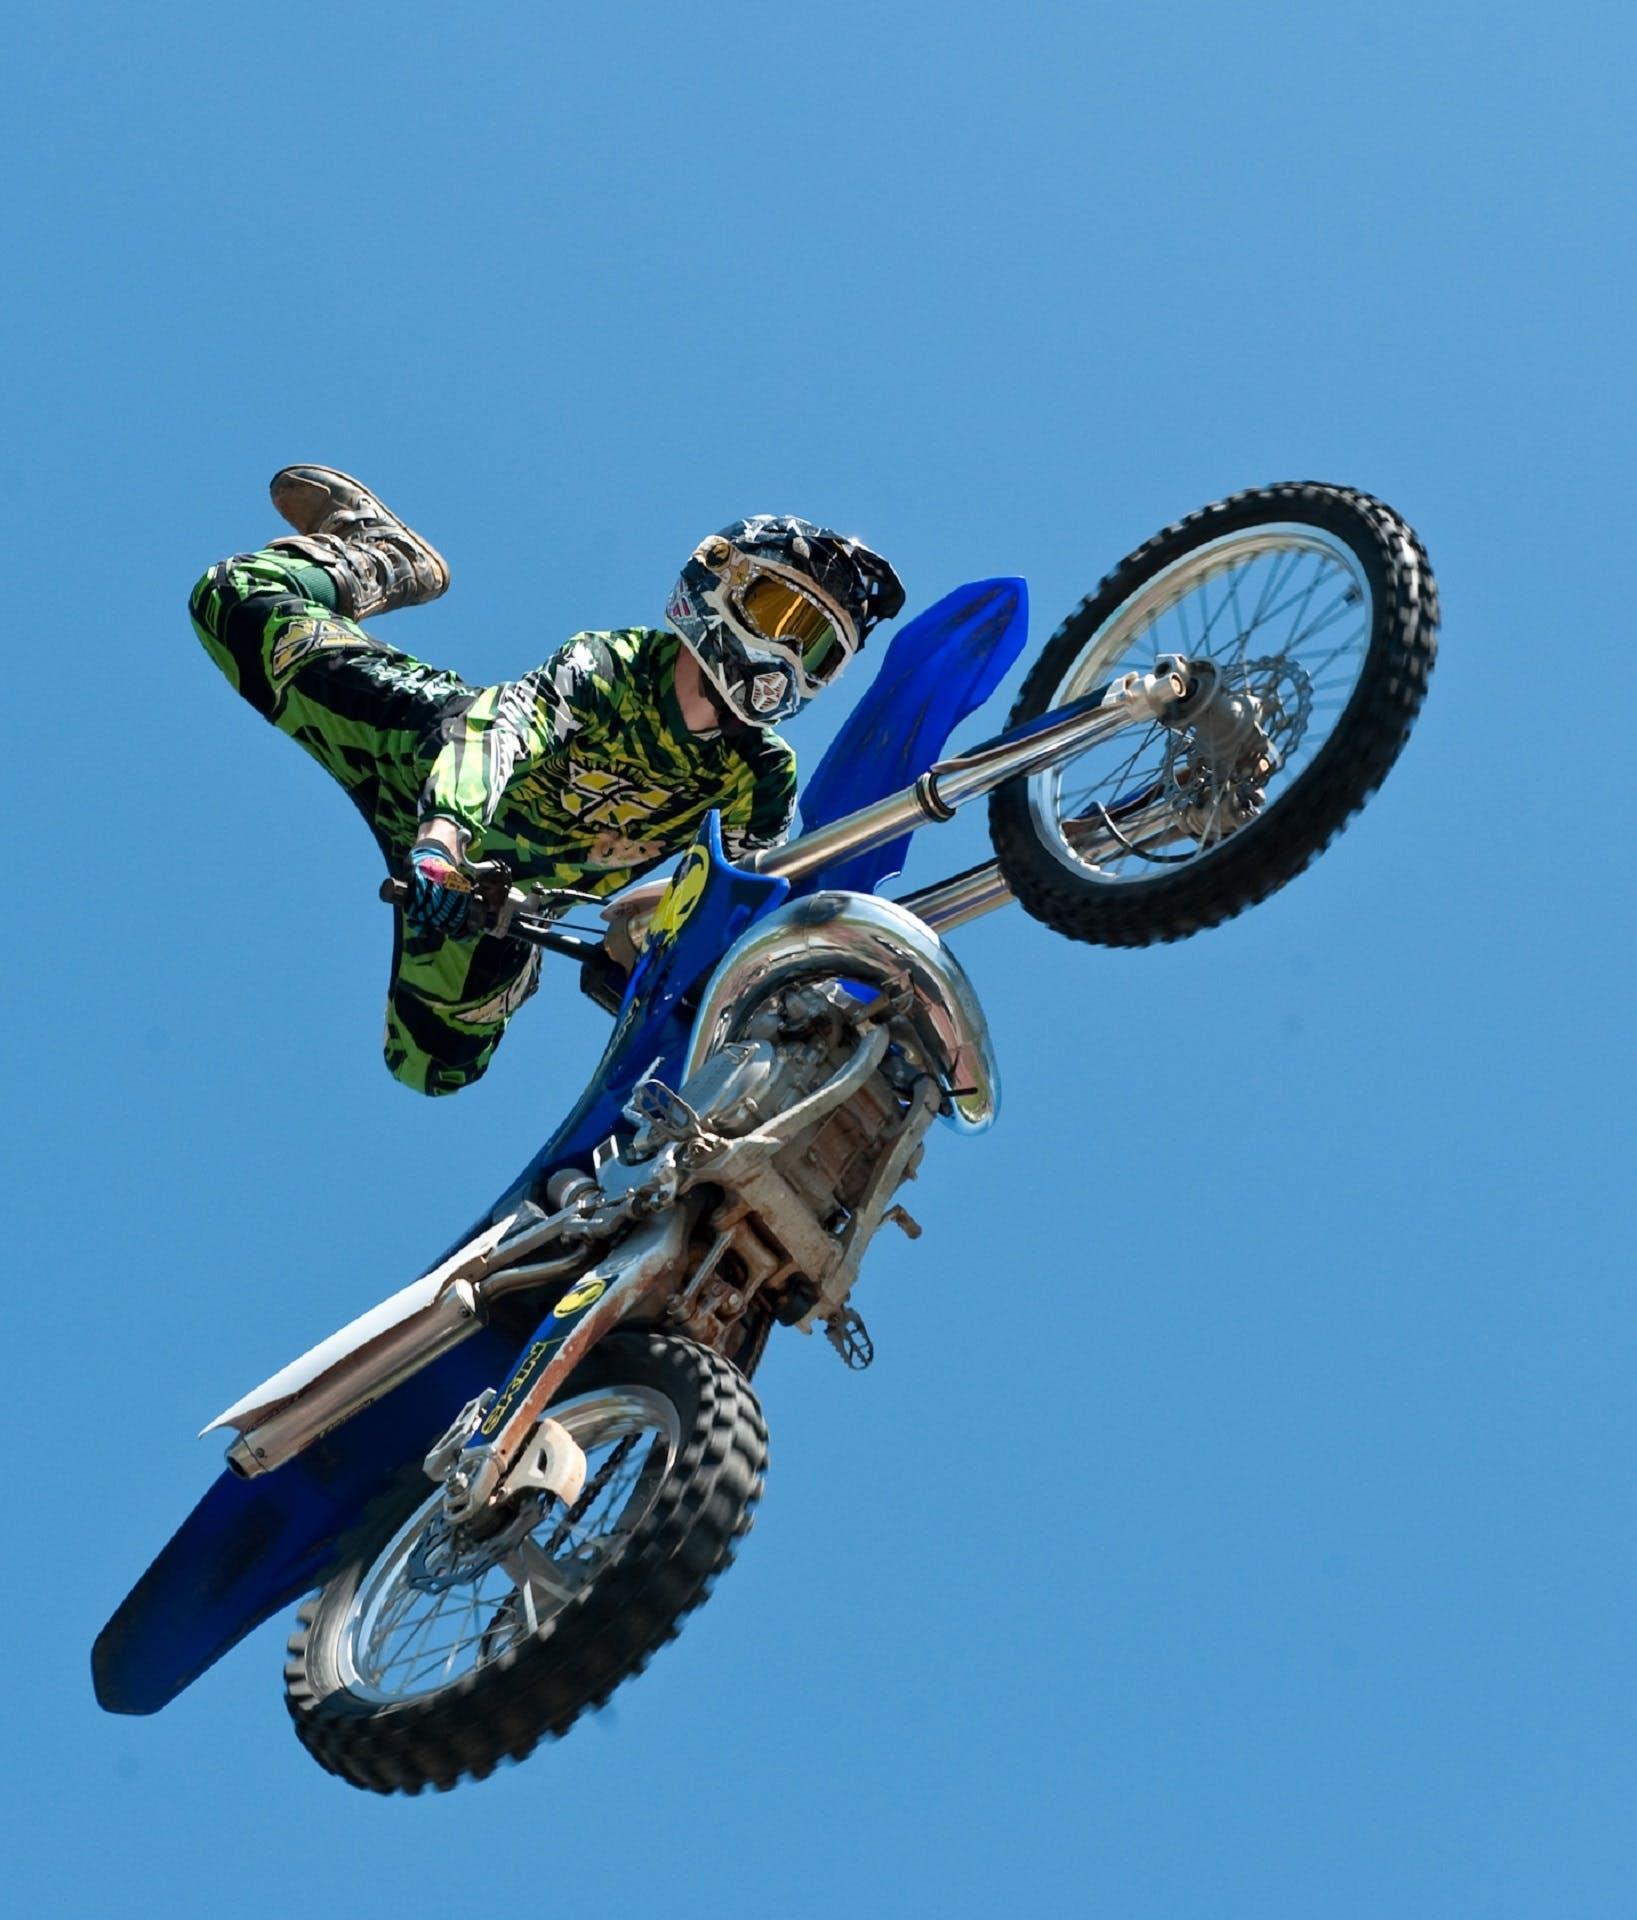 bike, fmx, freestyle